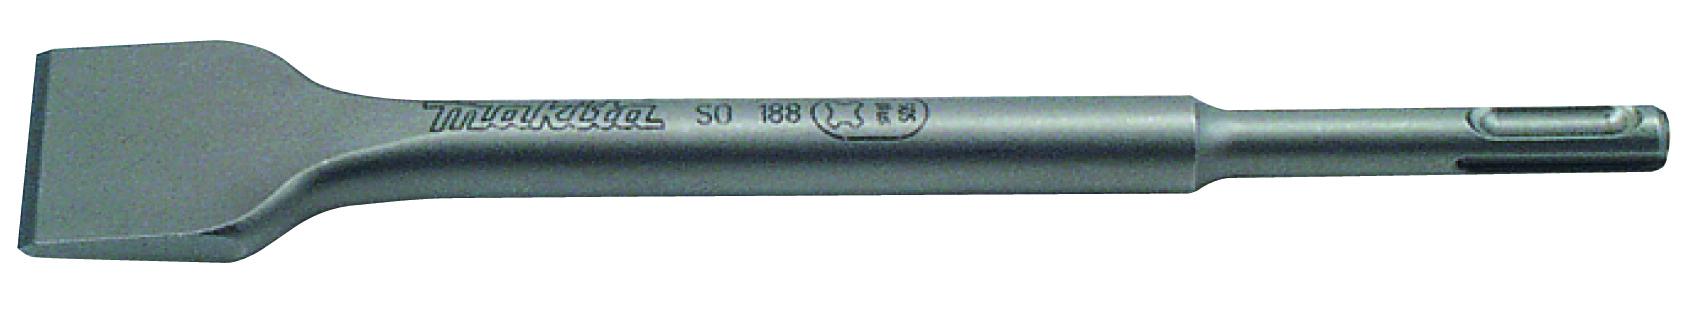 CINCEL 20 X 250MM D-07870